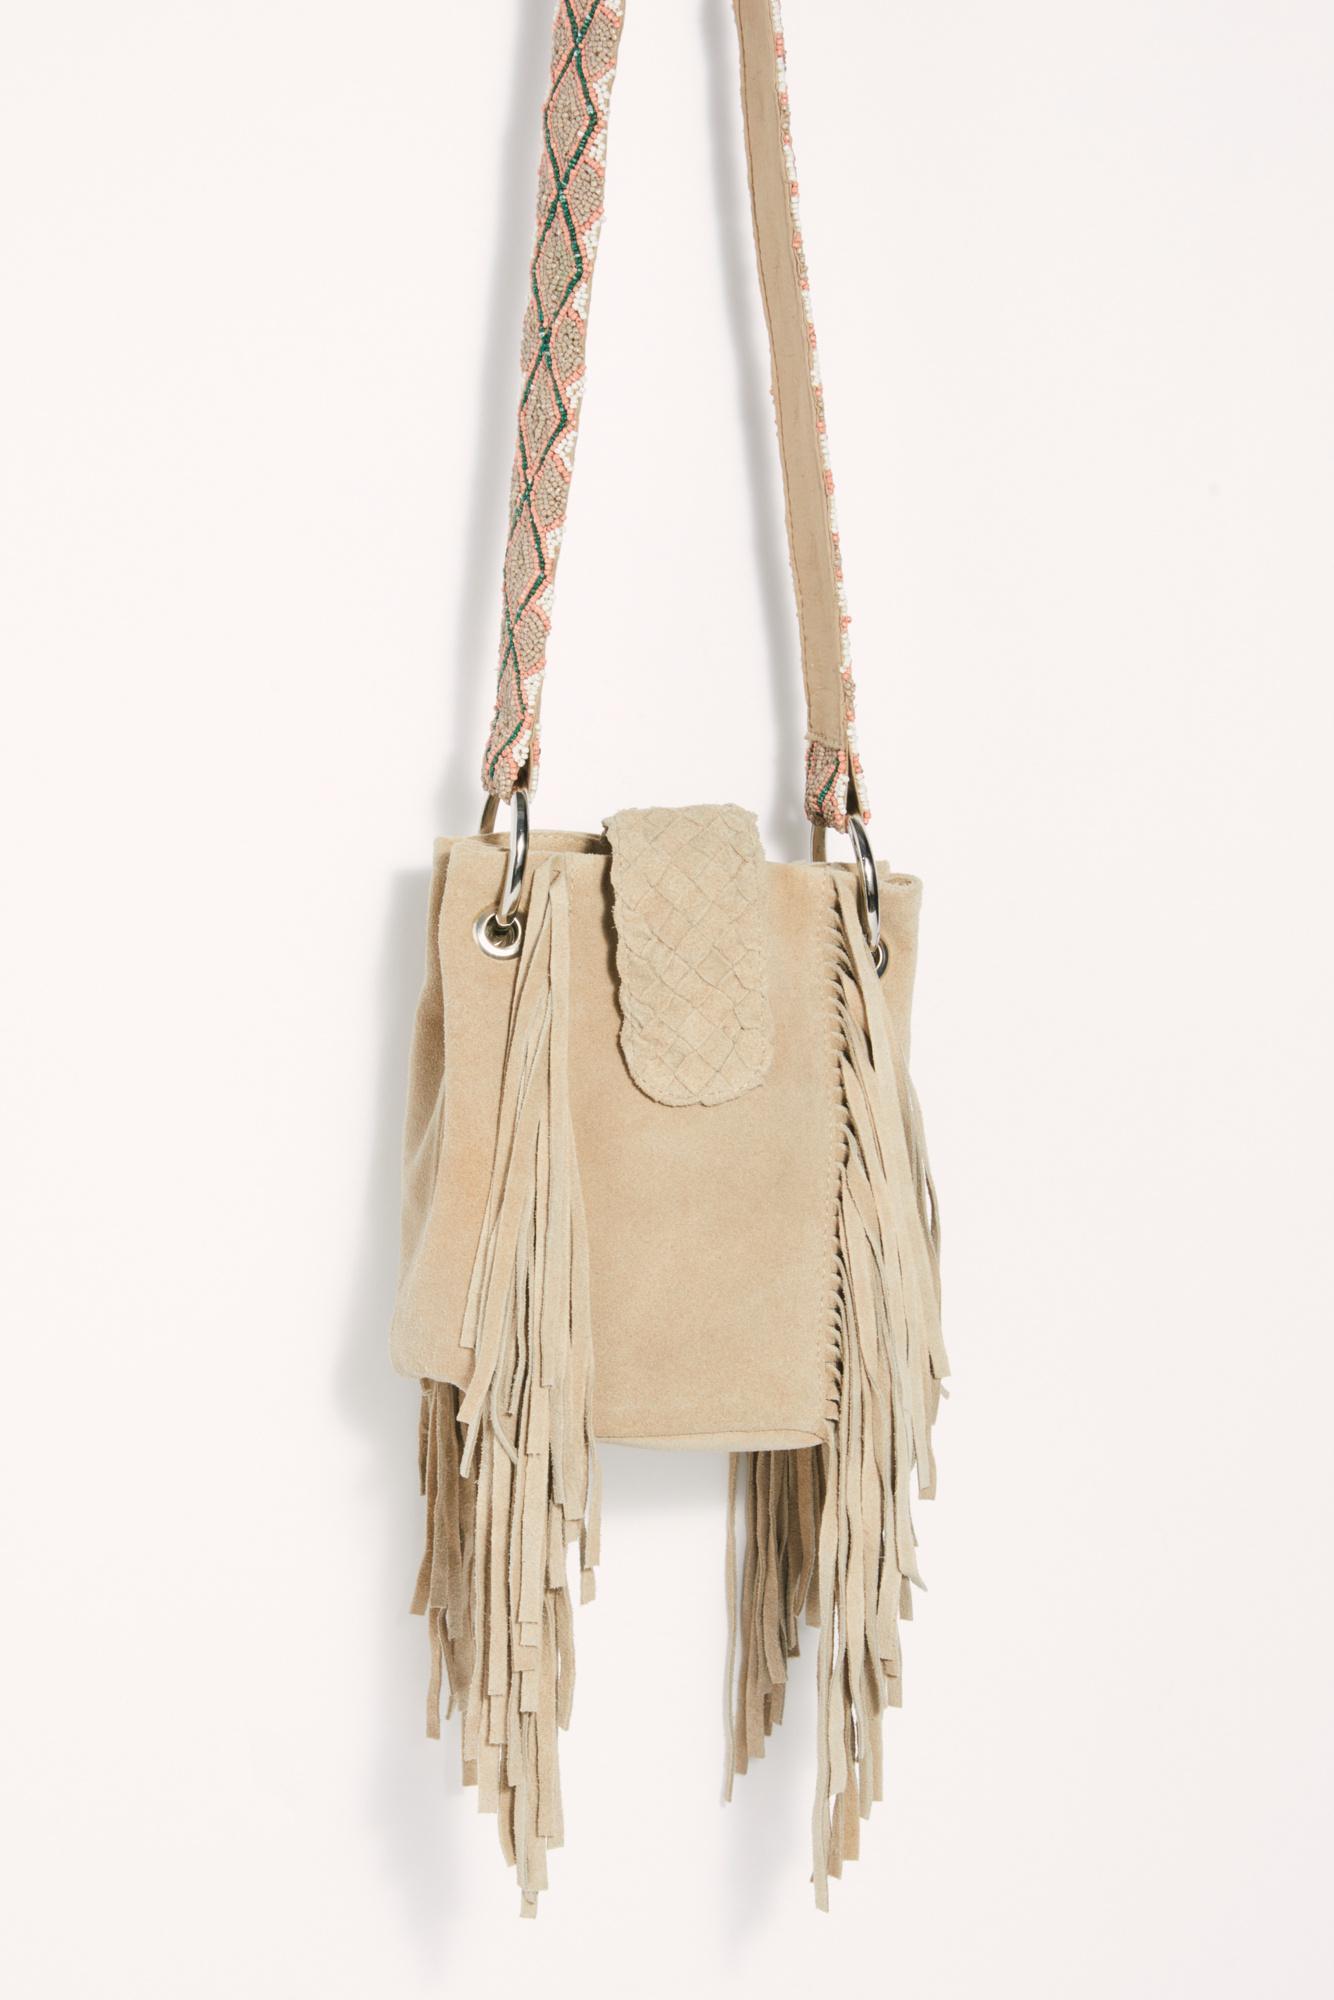 Free People Suede Love It Beaded Bucket Bag In Cream Natural Lyst